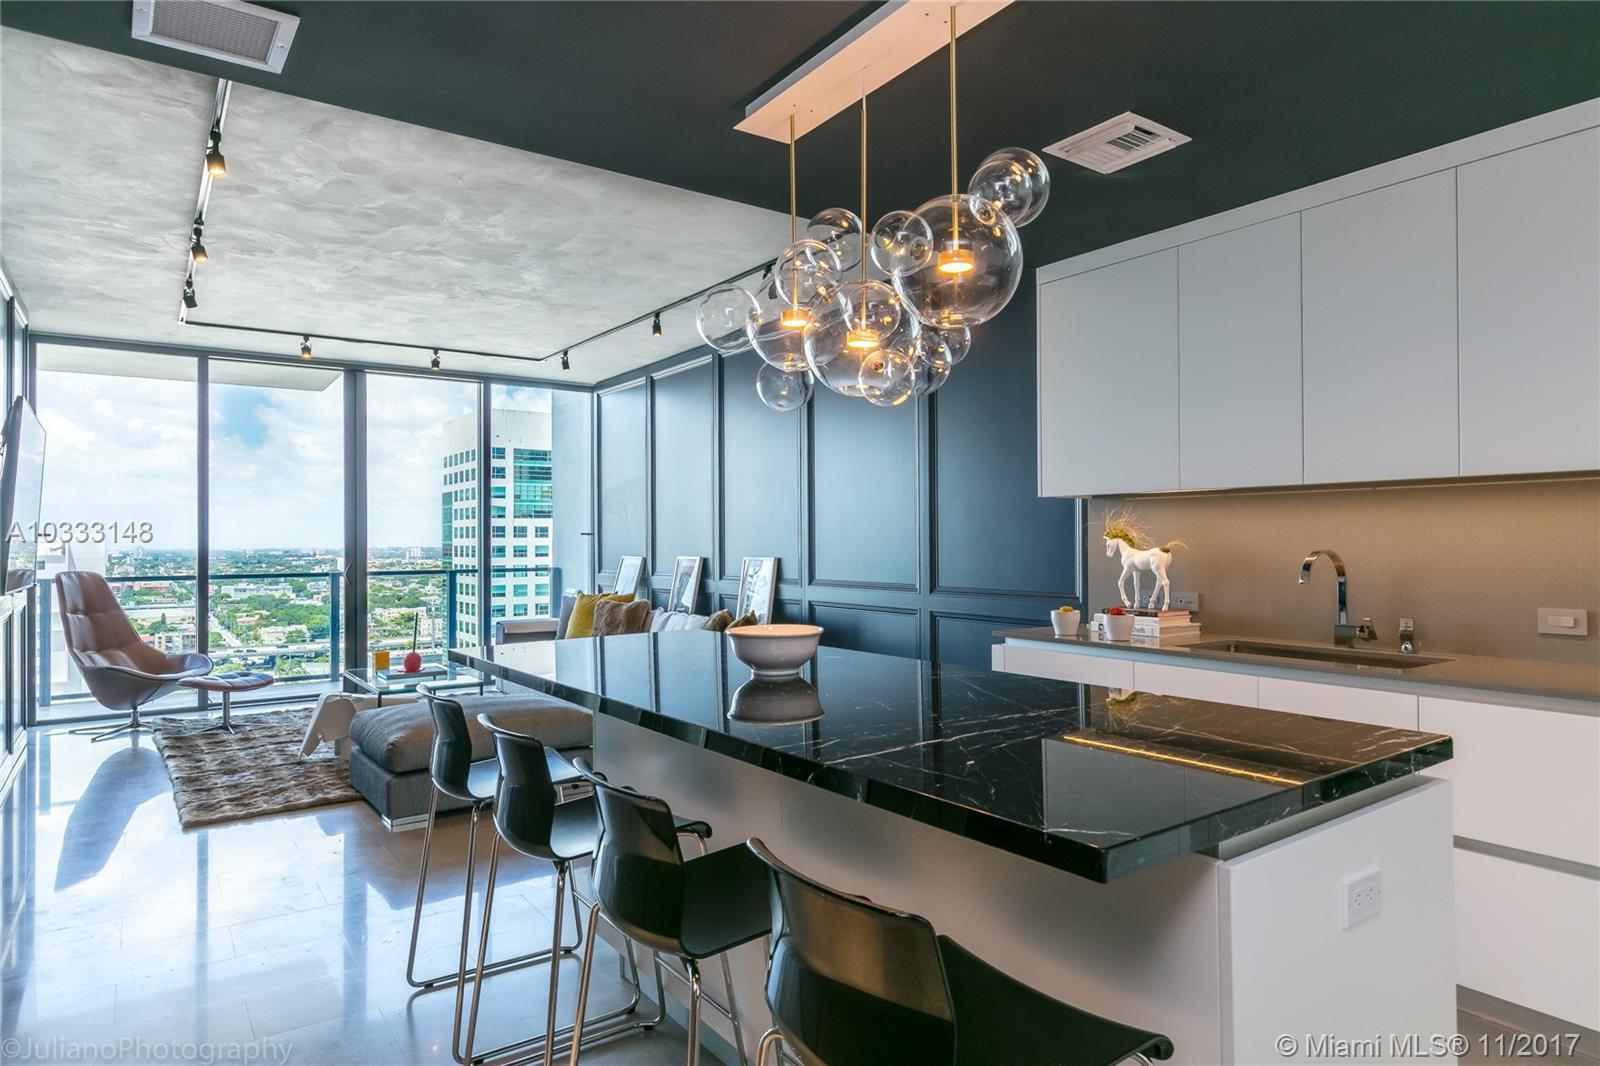 88 Sw 7 #1708 Miami FL, 33131 | RIK JONNA